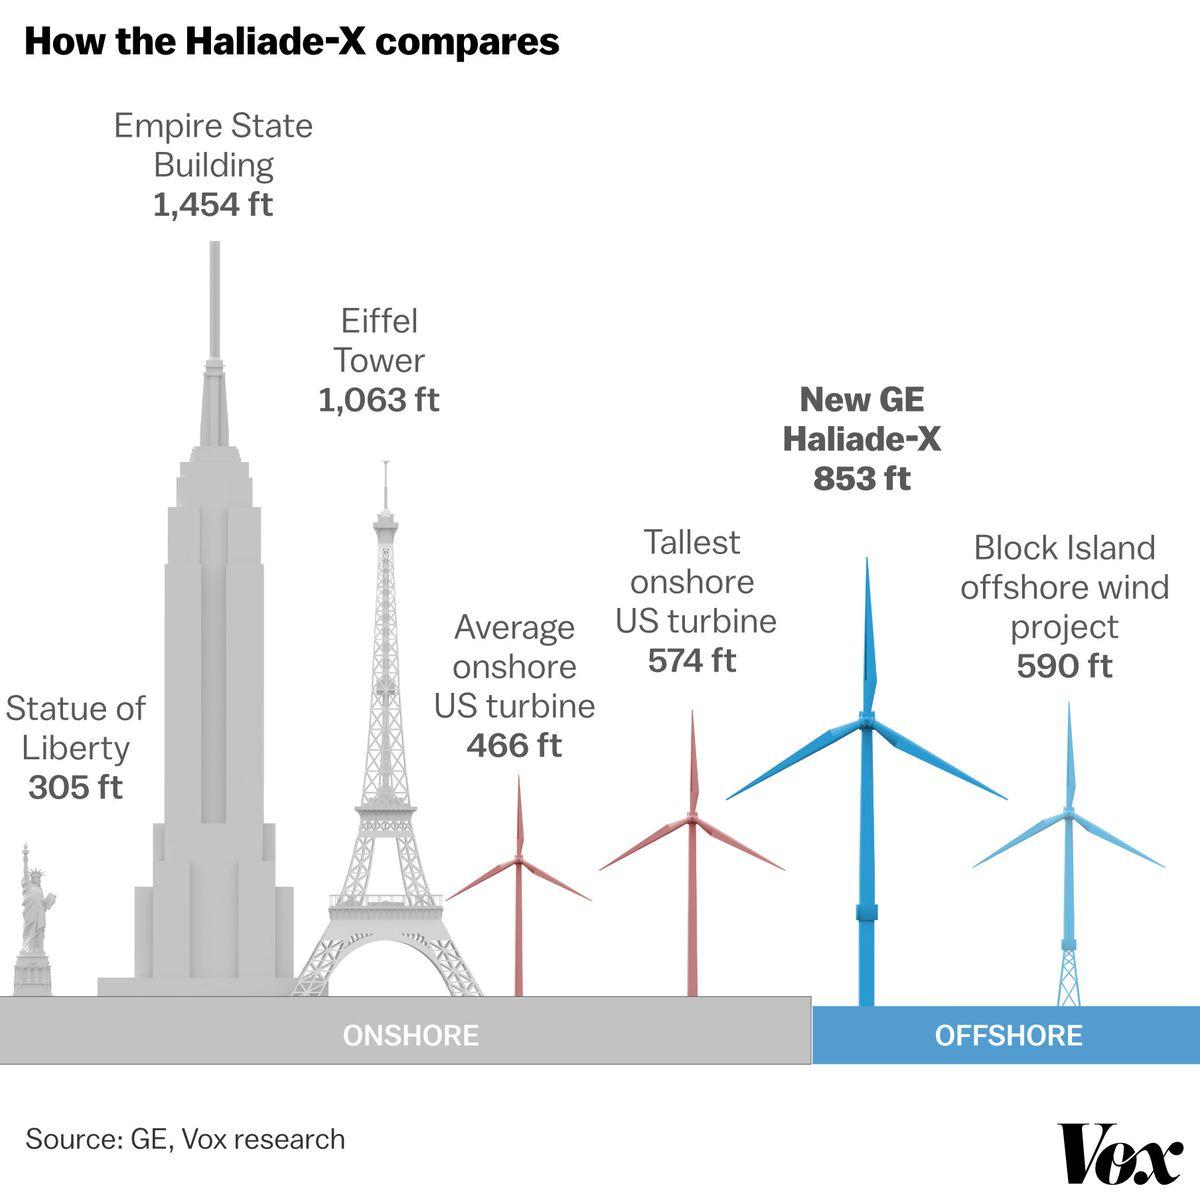 wind turbine height - haliade-x